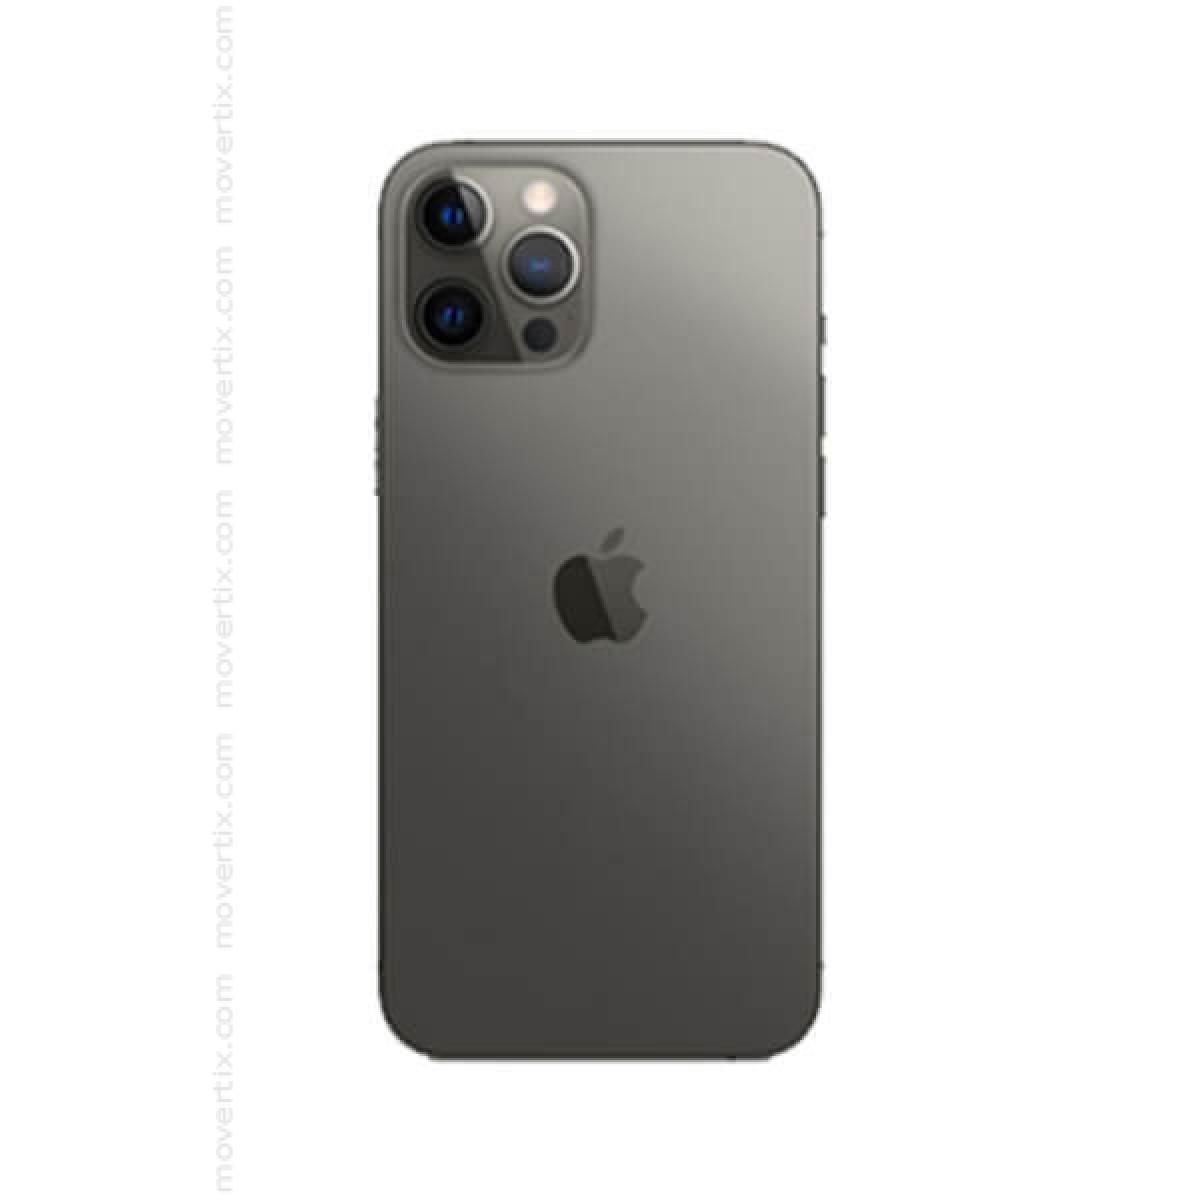 iPhone 20 Pro Max in Graphit mit 208GB